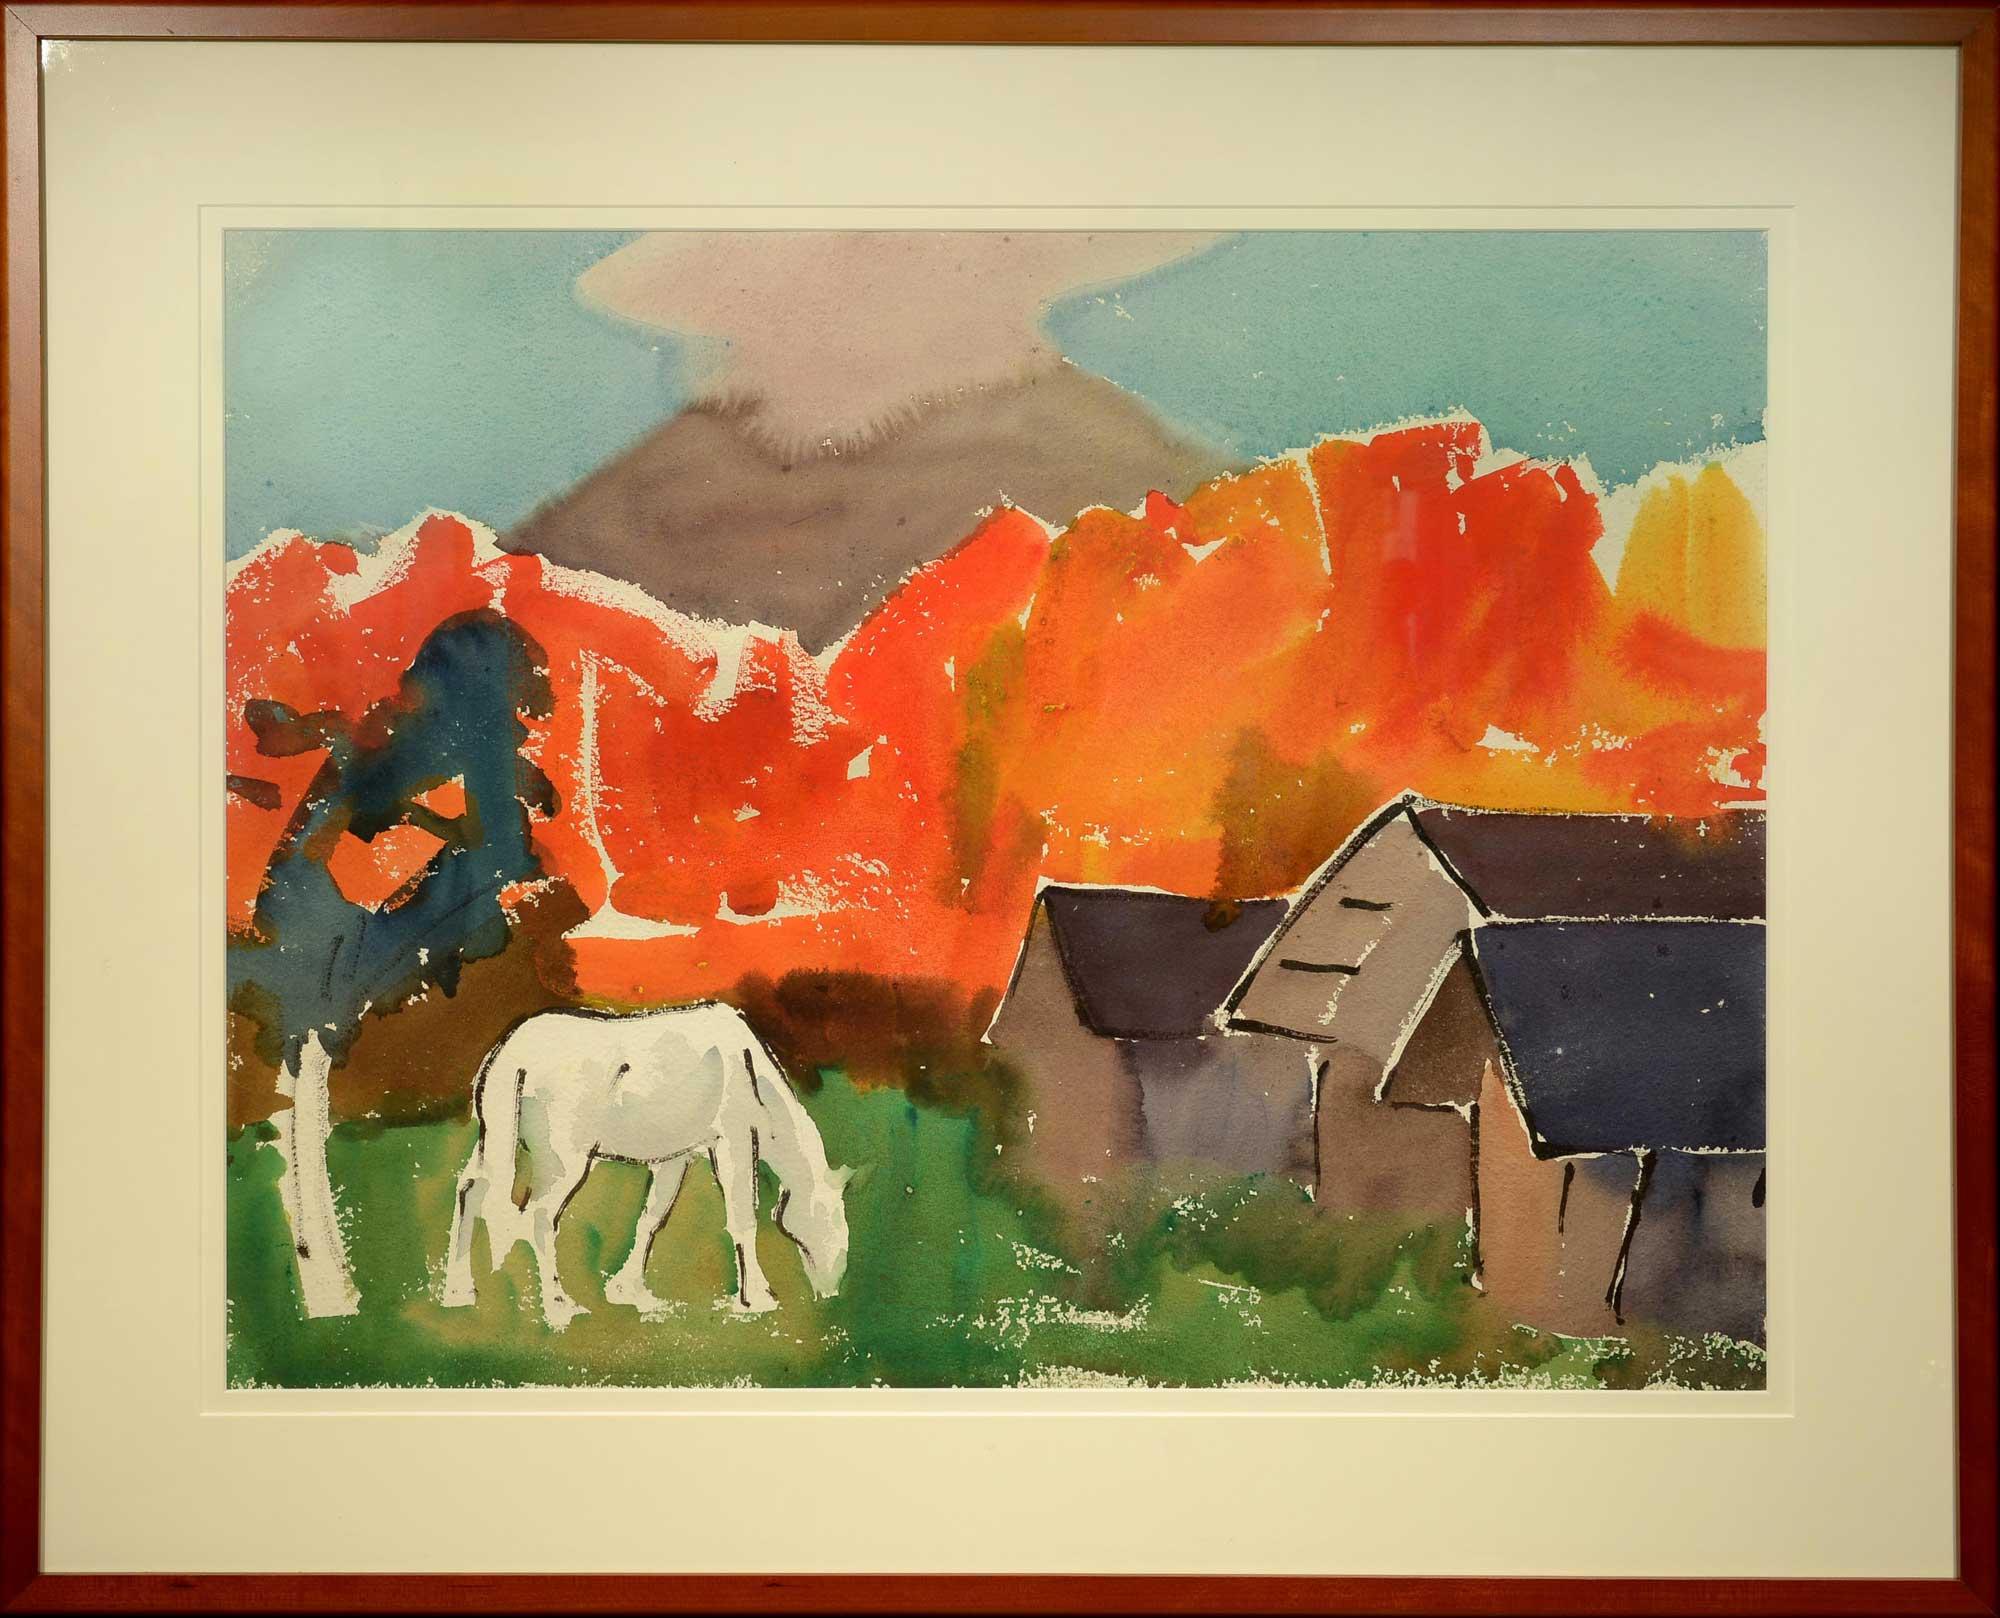 James Fitzgerald Autumn Brilliance framed